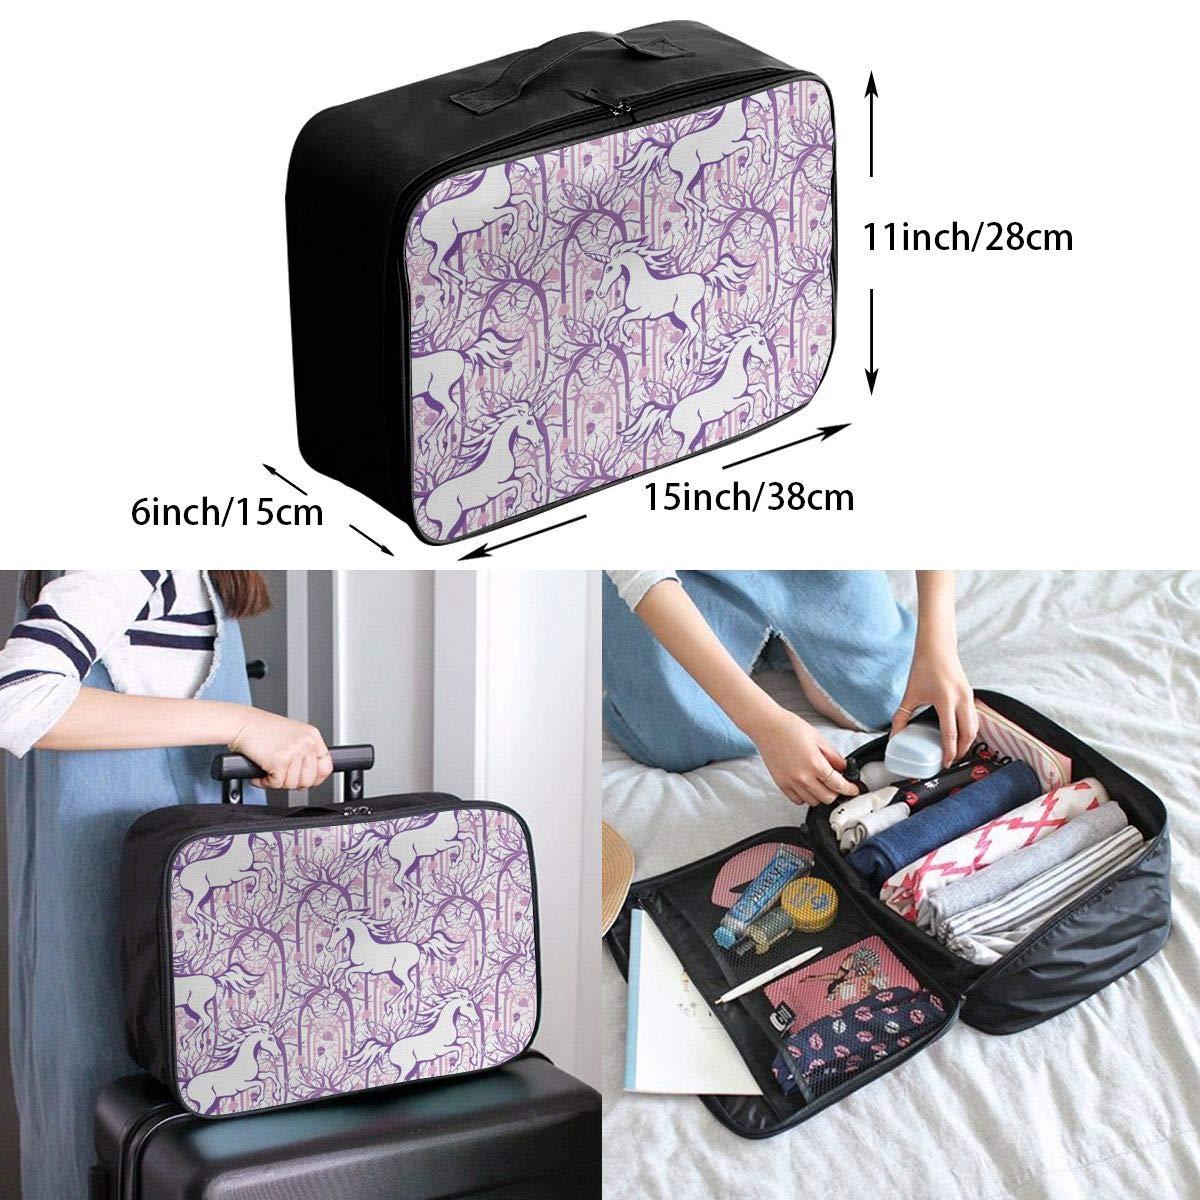 ADGAI Unicorn Galloping Canvas Travel Weekender Bag,Fashion Custom Lightweight Large Capacity Portable Luggage Bag,Suitcase Trolley Bag